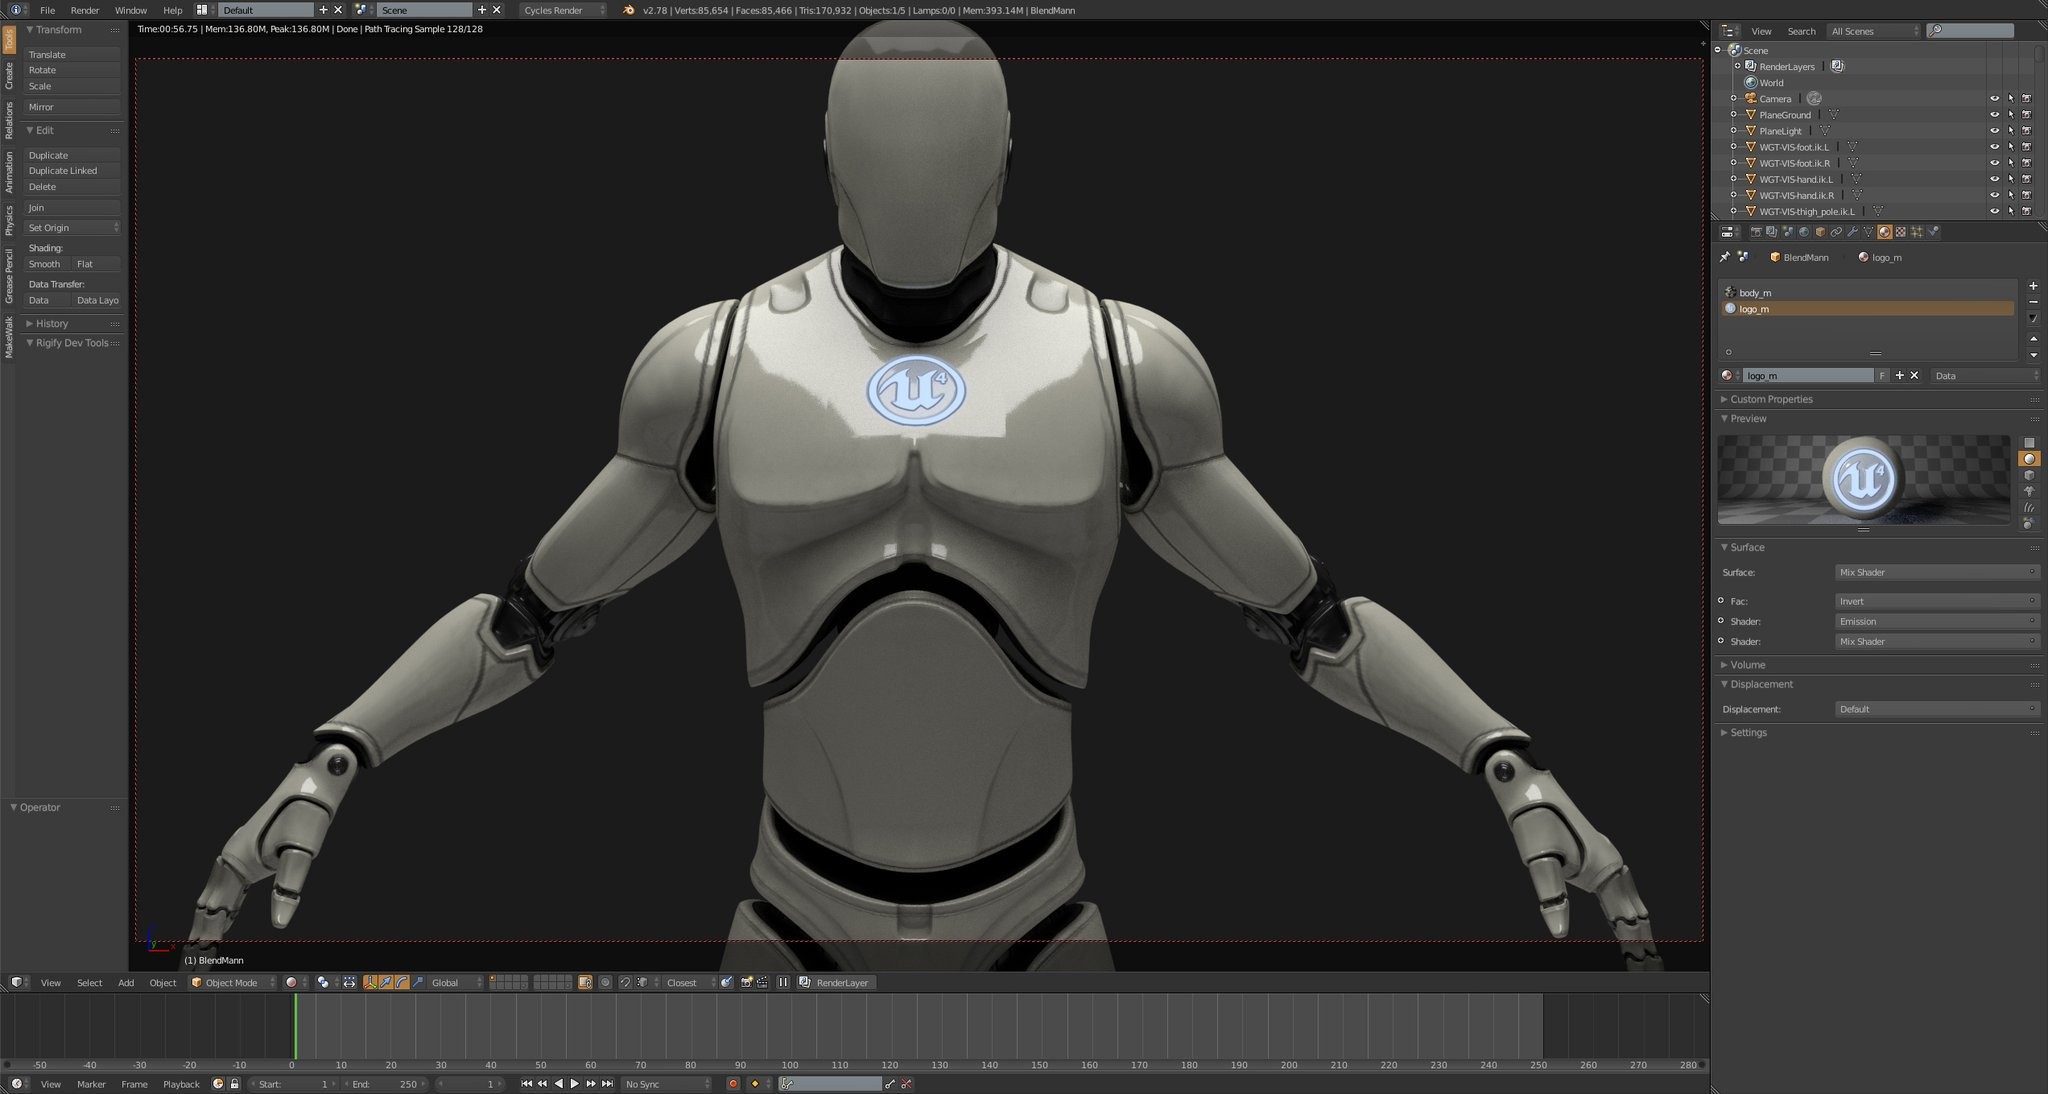 Blender Unreal 4 Epic Live Stream Training - Latest News - Blender